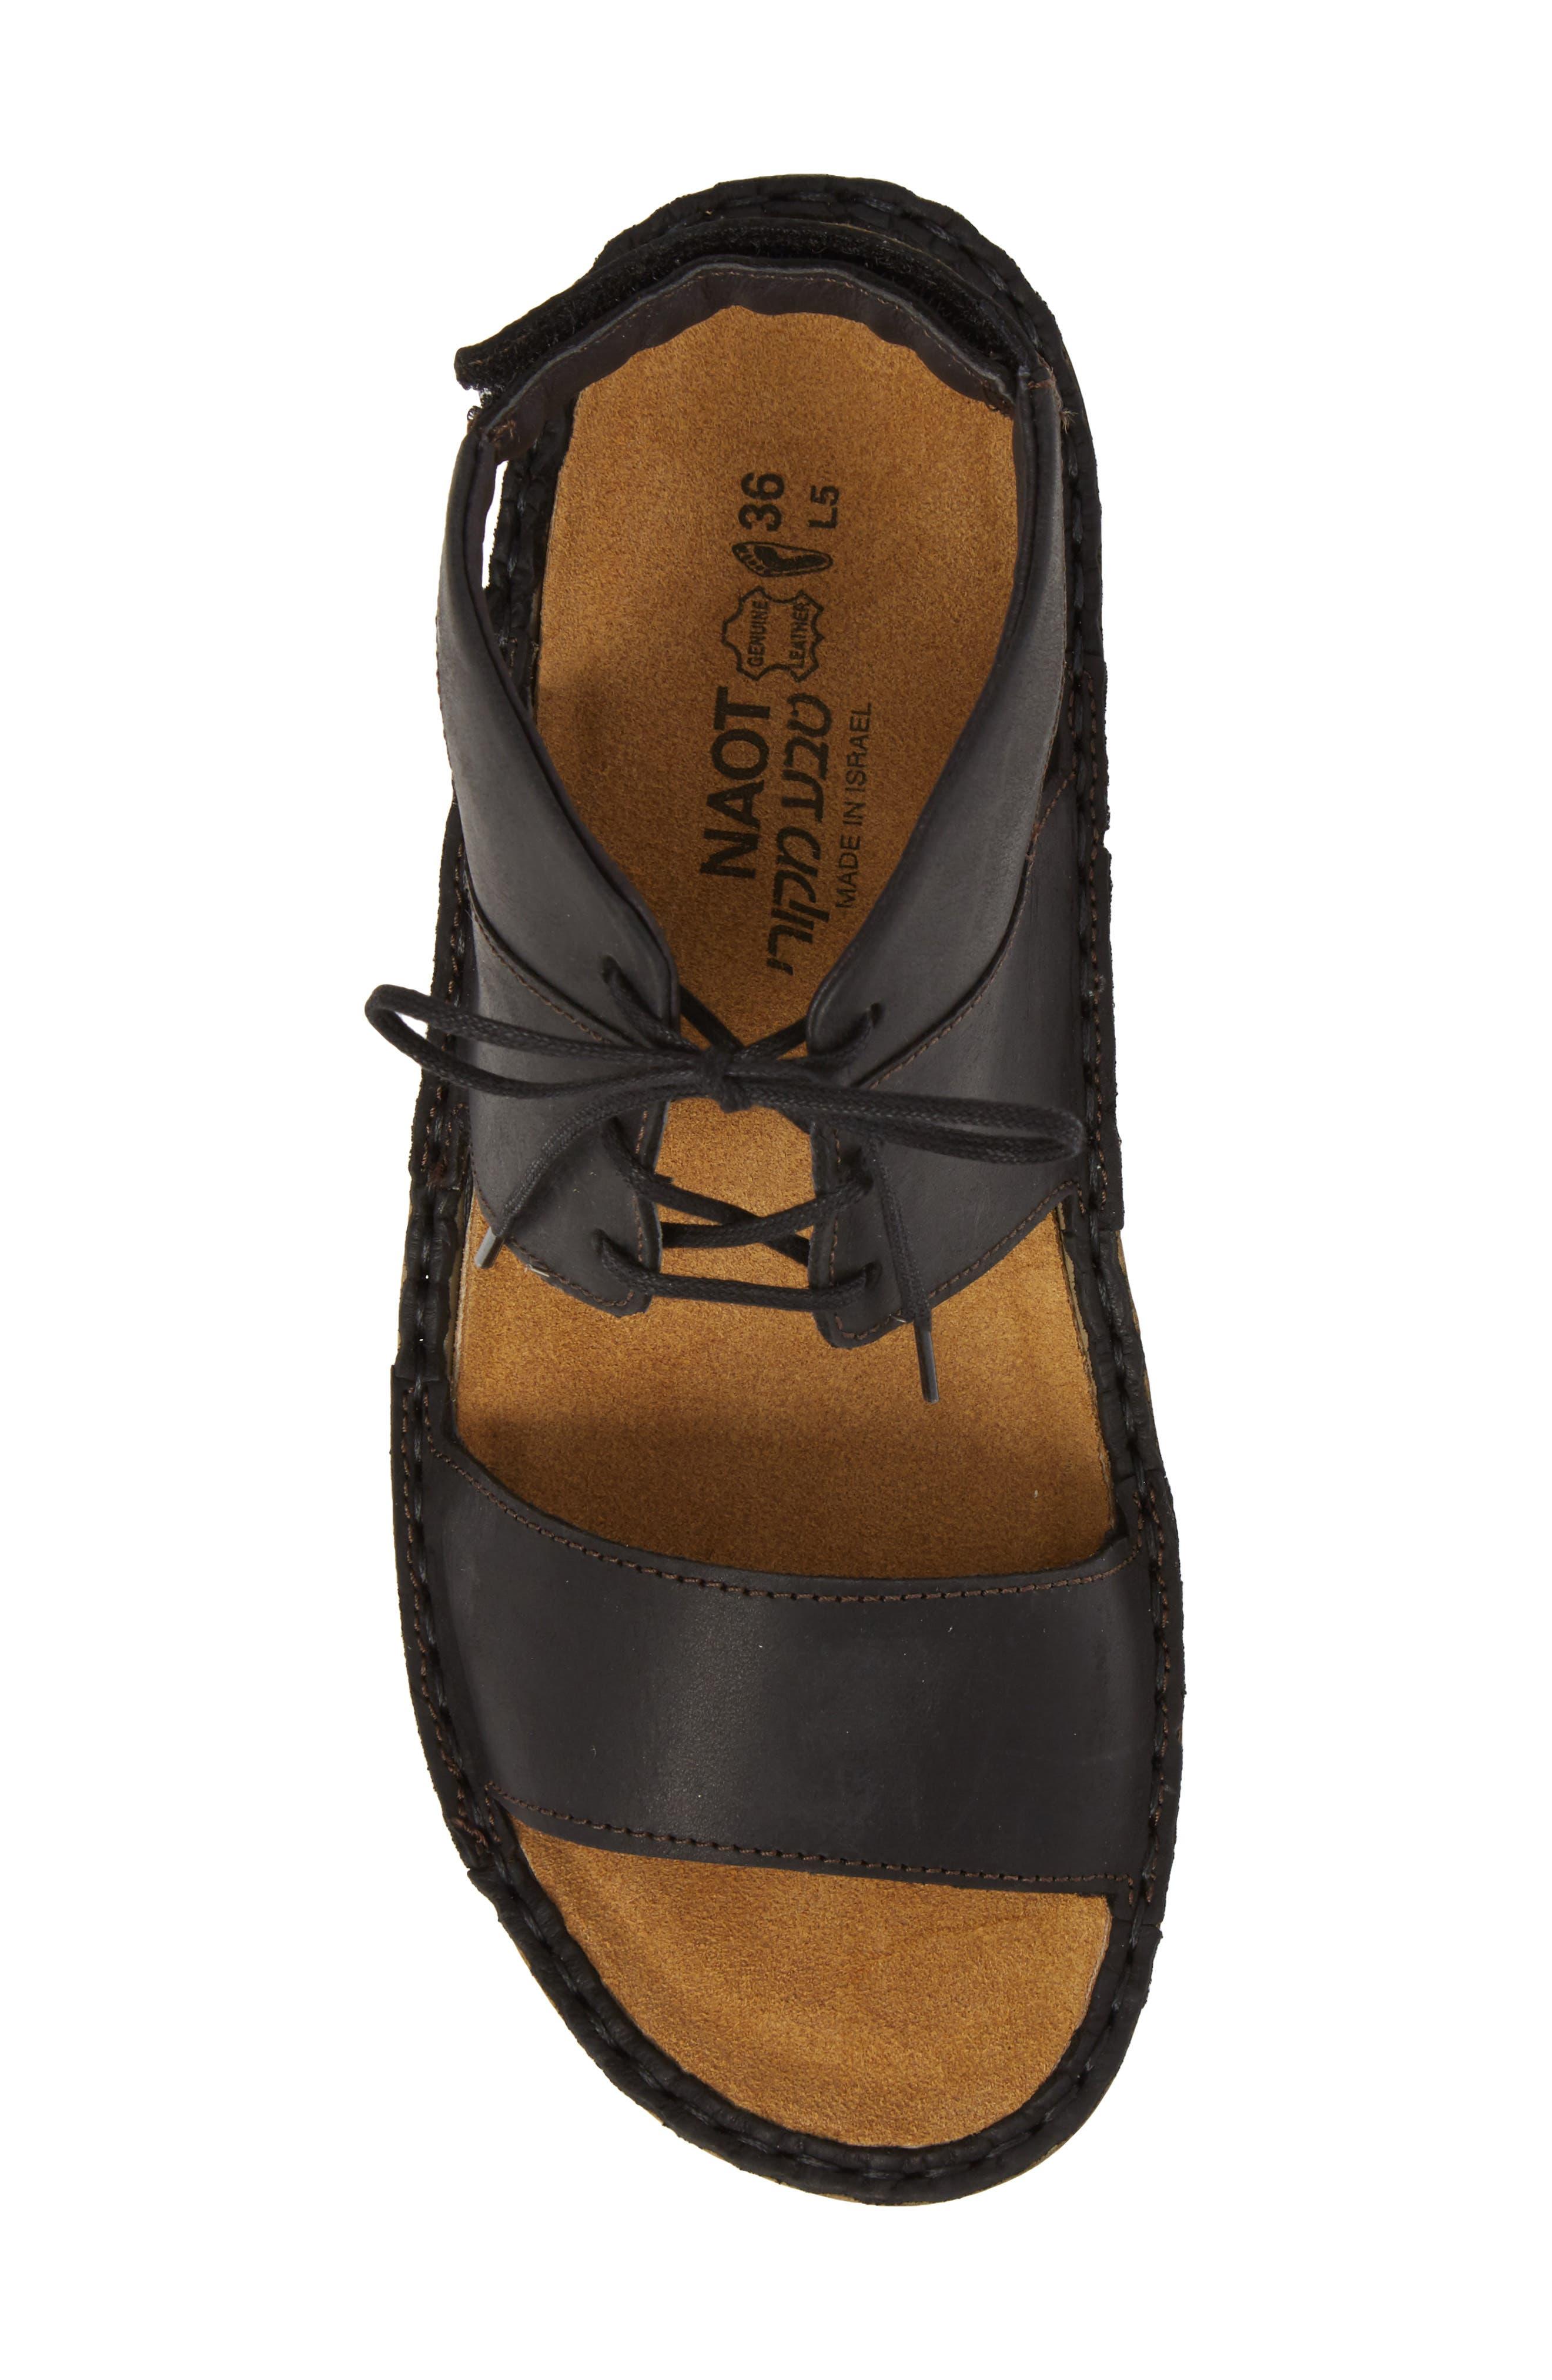 Apicola Sandal,                             Alternate thumbnail 5, color,                             Oily Coal Nubuck